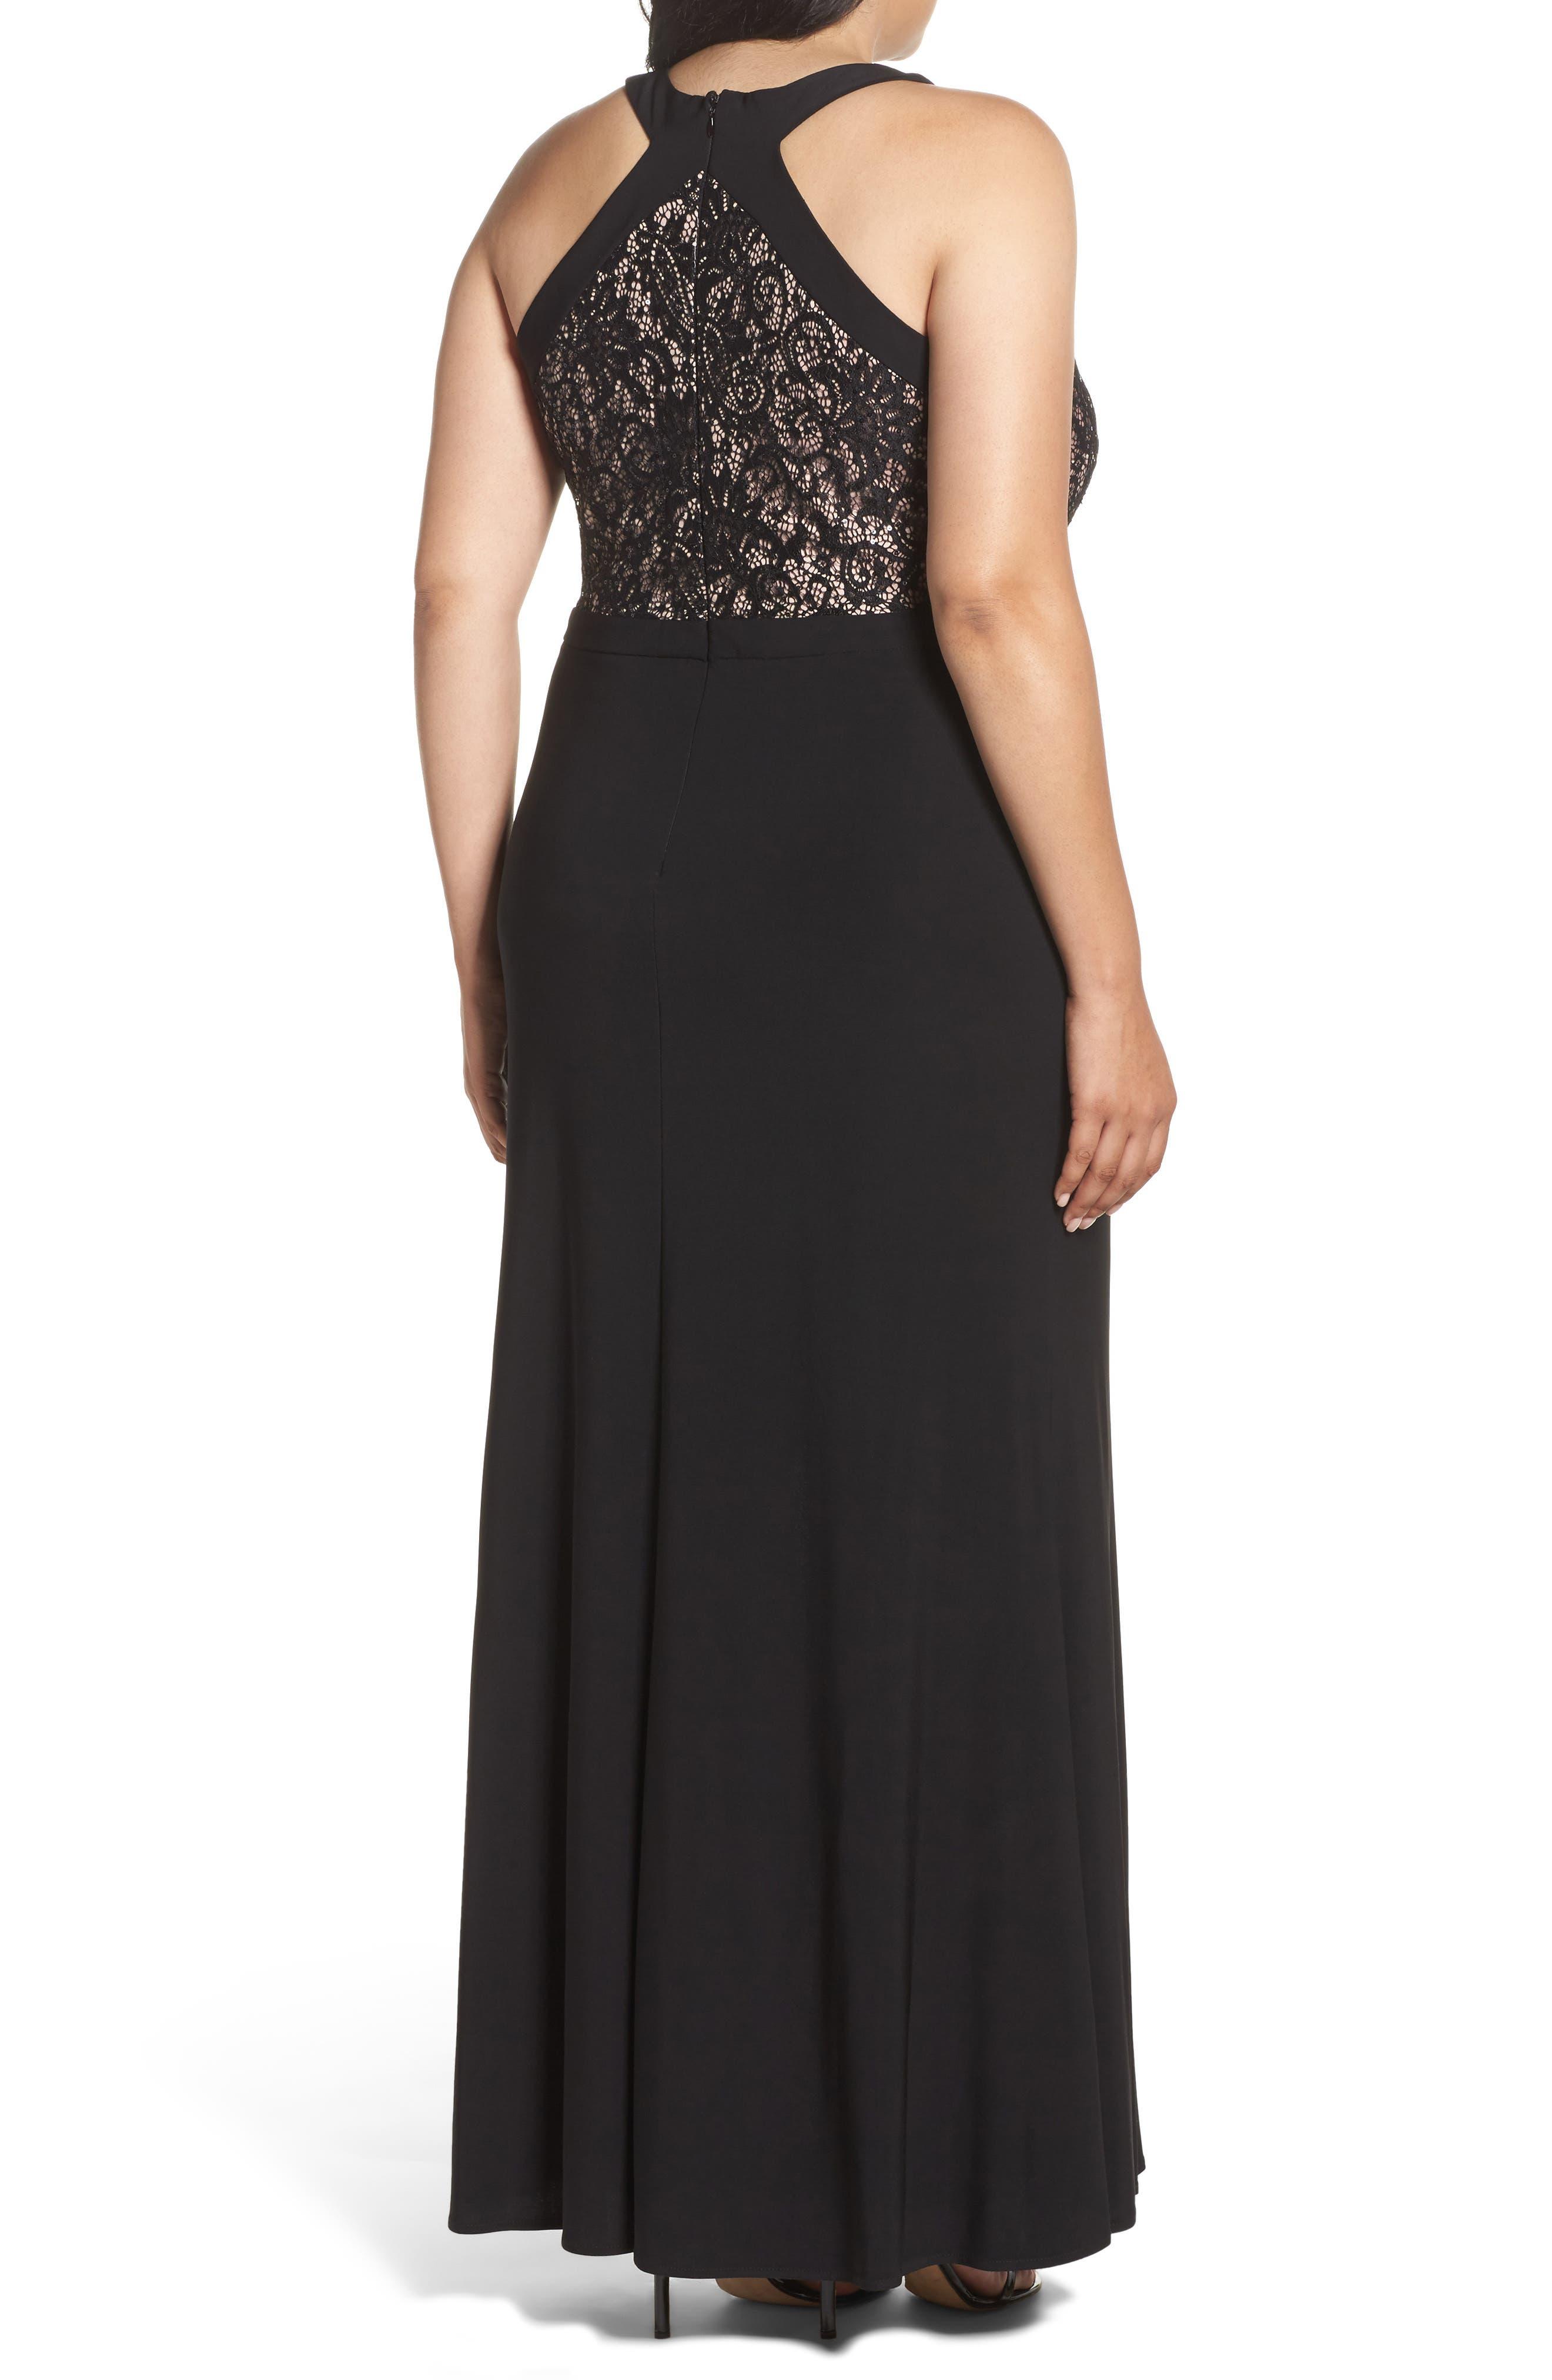 MORGAN & CO.,                             Lace Bodice Dress,                             Alternate thumbnail 2, color,                             BLACK/ NUDE